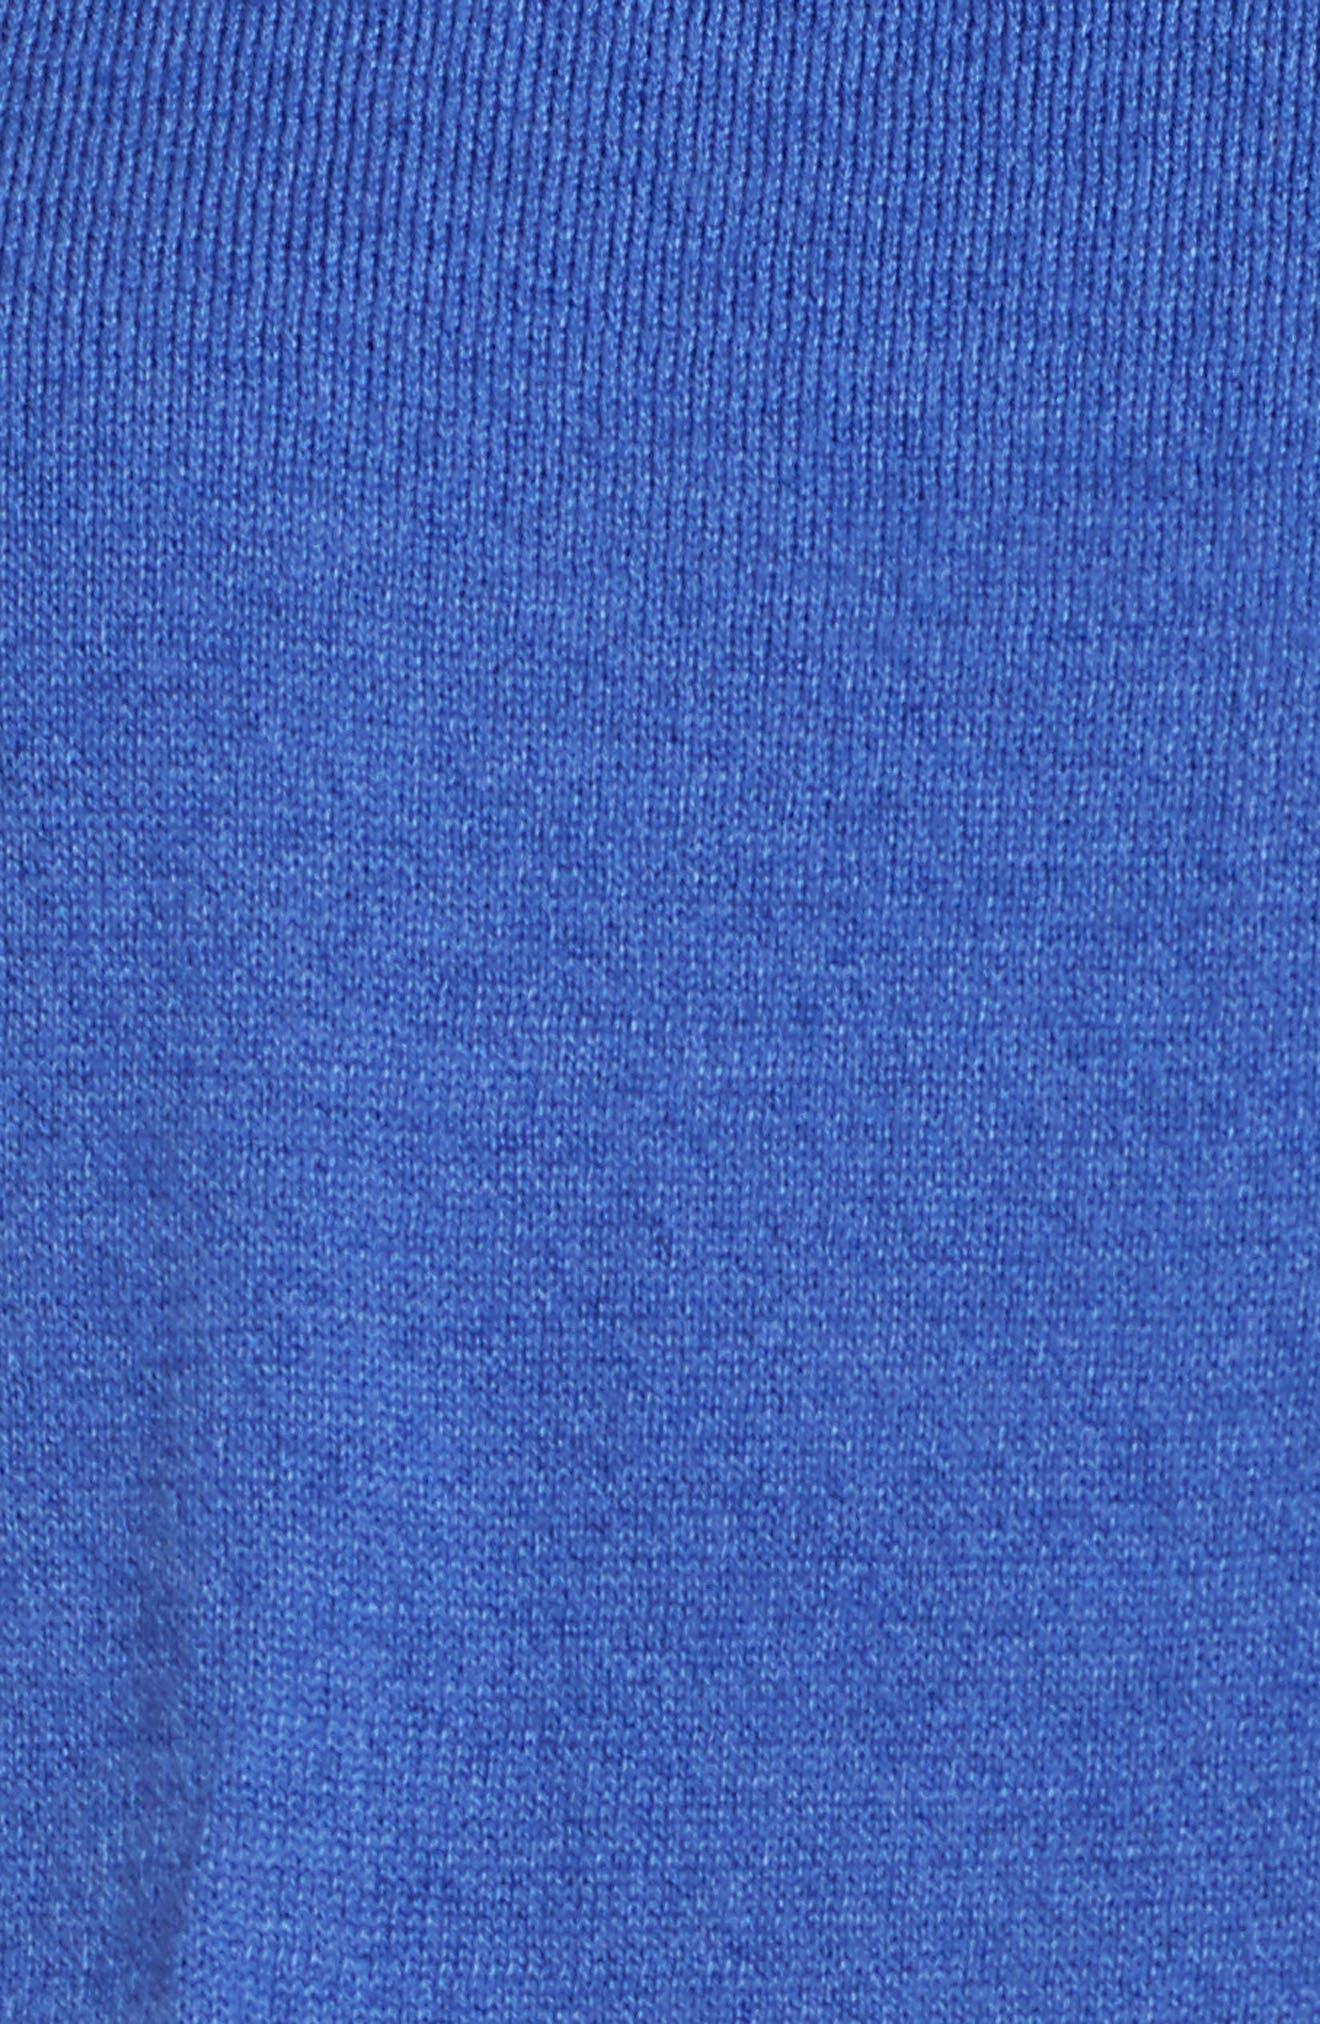 Pima Cotton Blend Tie Sweater,                             Alternate thumbnail 6, color,                             Blue Marine